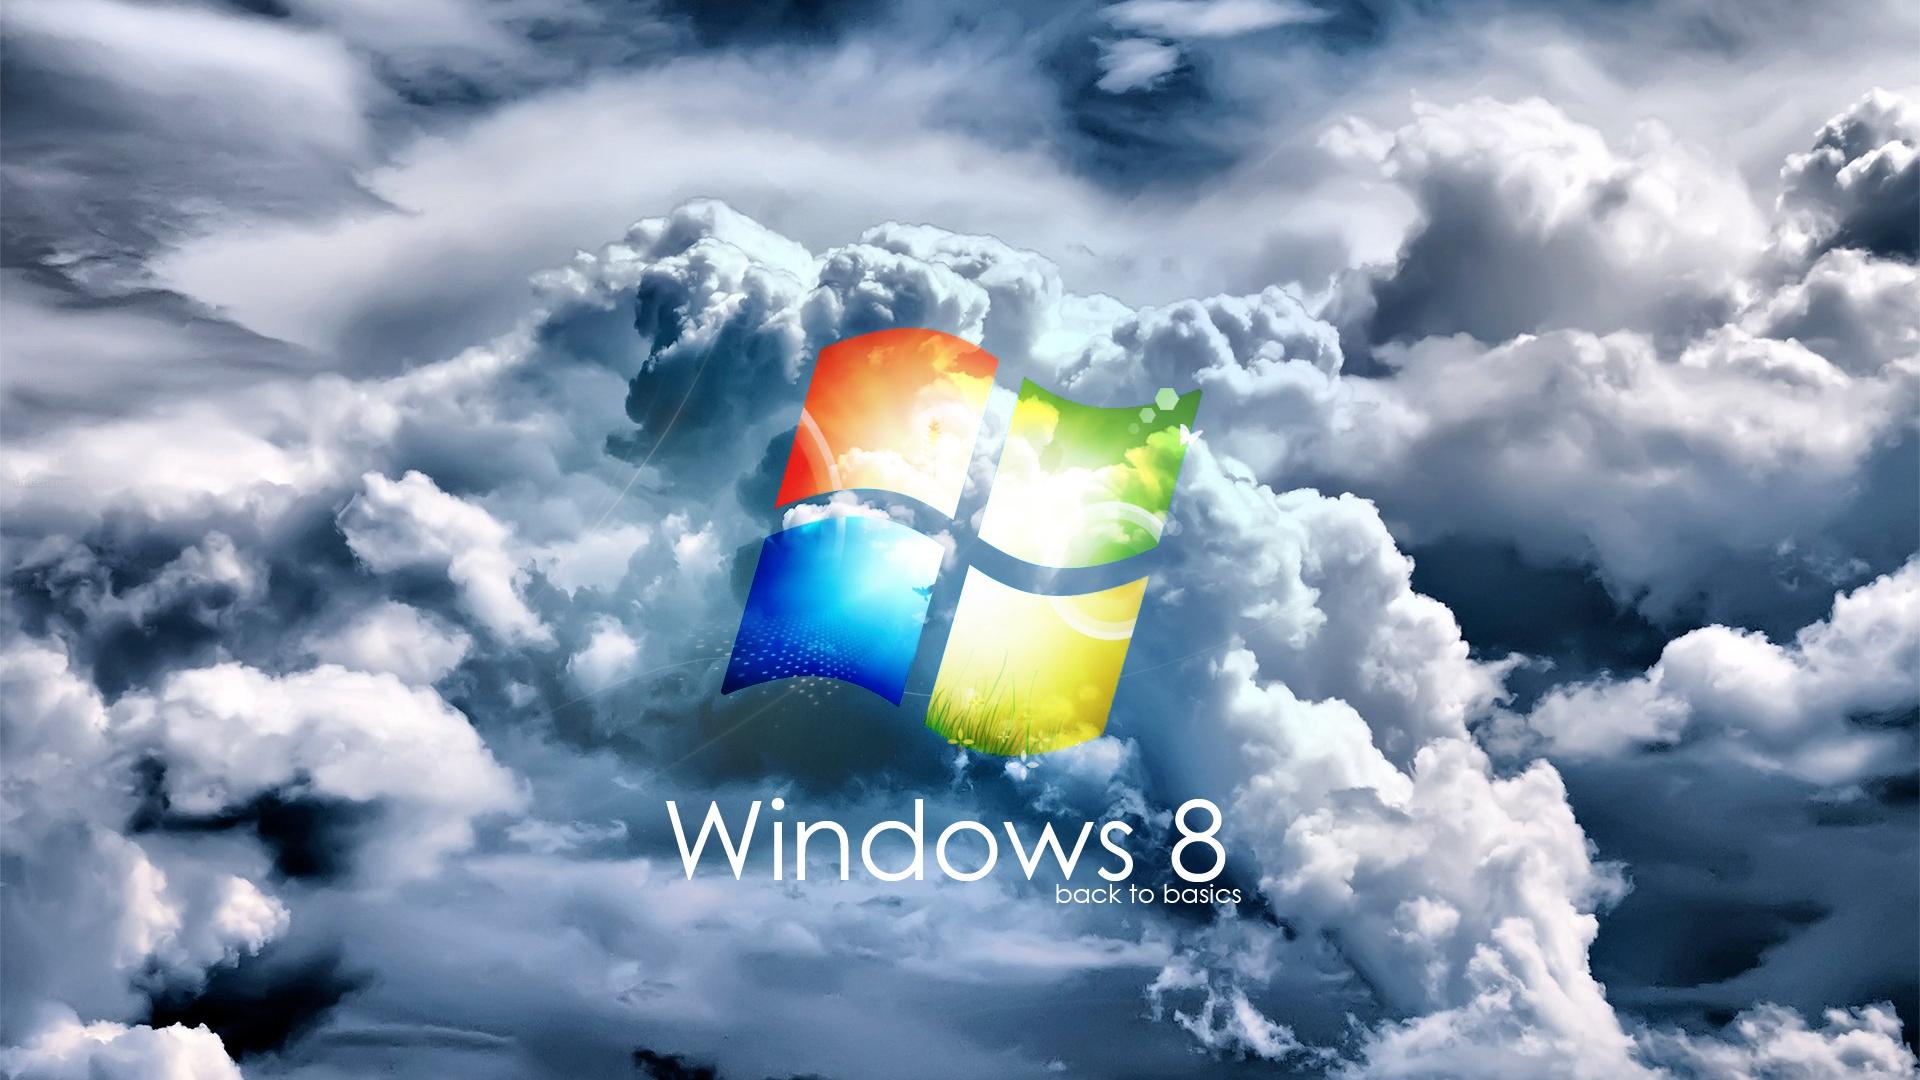 http://4.bp.blogspot.com/-lUnWz3VQ_1w/UCNMrvLCLGI/AAAAAAAAAds/uvqzzN2qoHU/s4000/Windows+8+Hd+1080+Wallpaper+(35).jpg